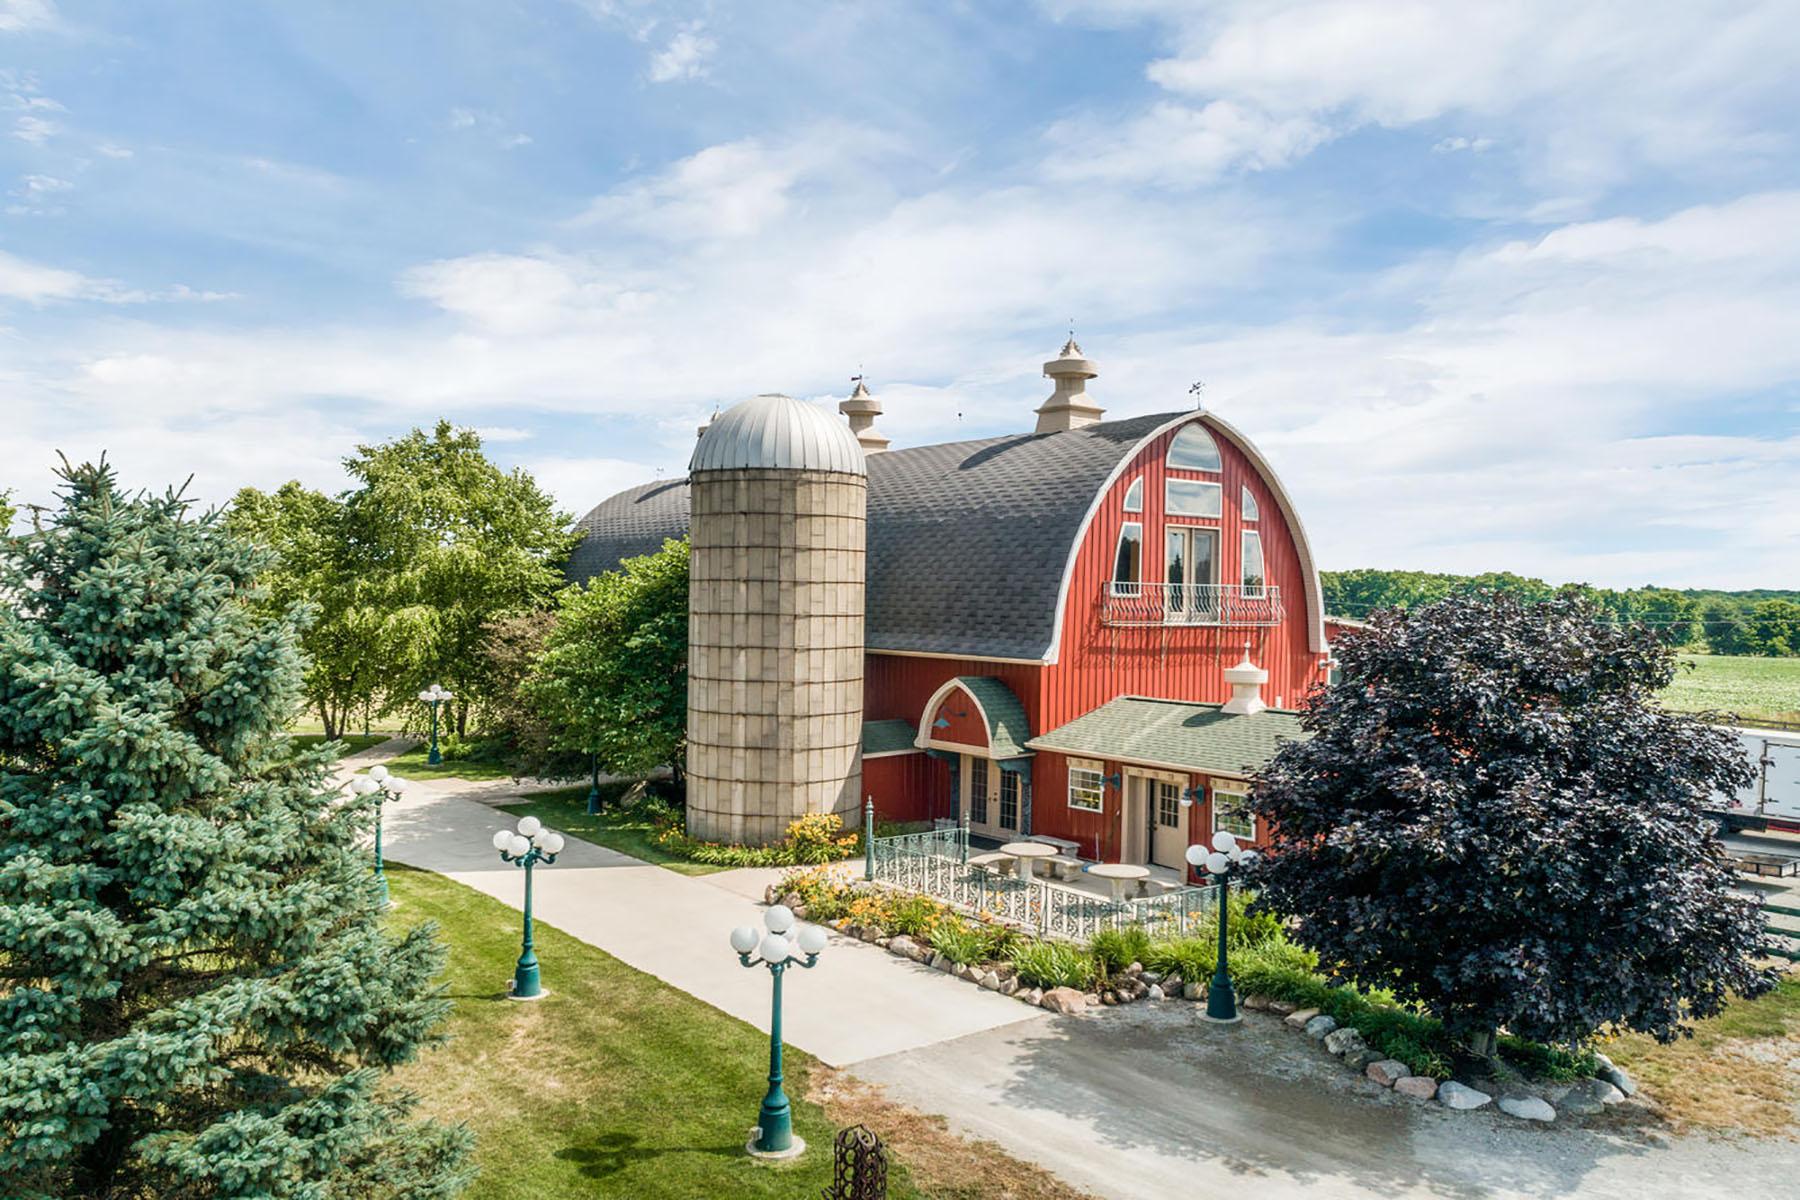 Single Family Homes for Active at Elba Township 2681 Hadley Road Elba Township, Michigan 48446 United States